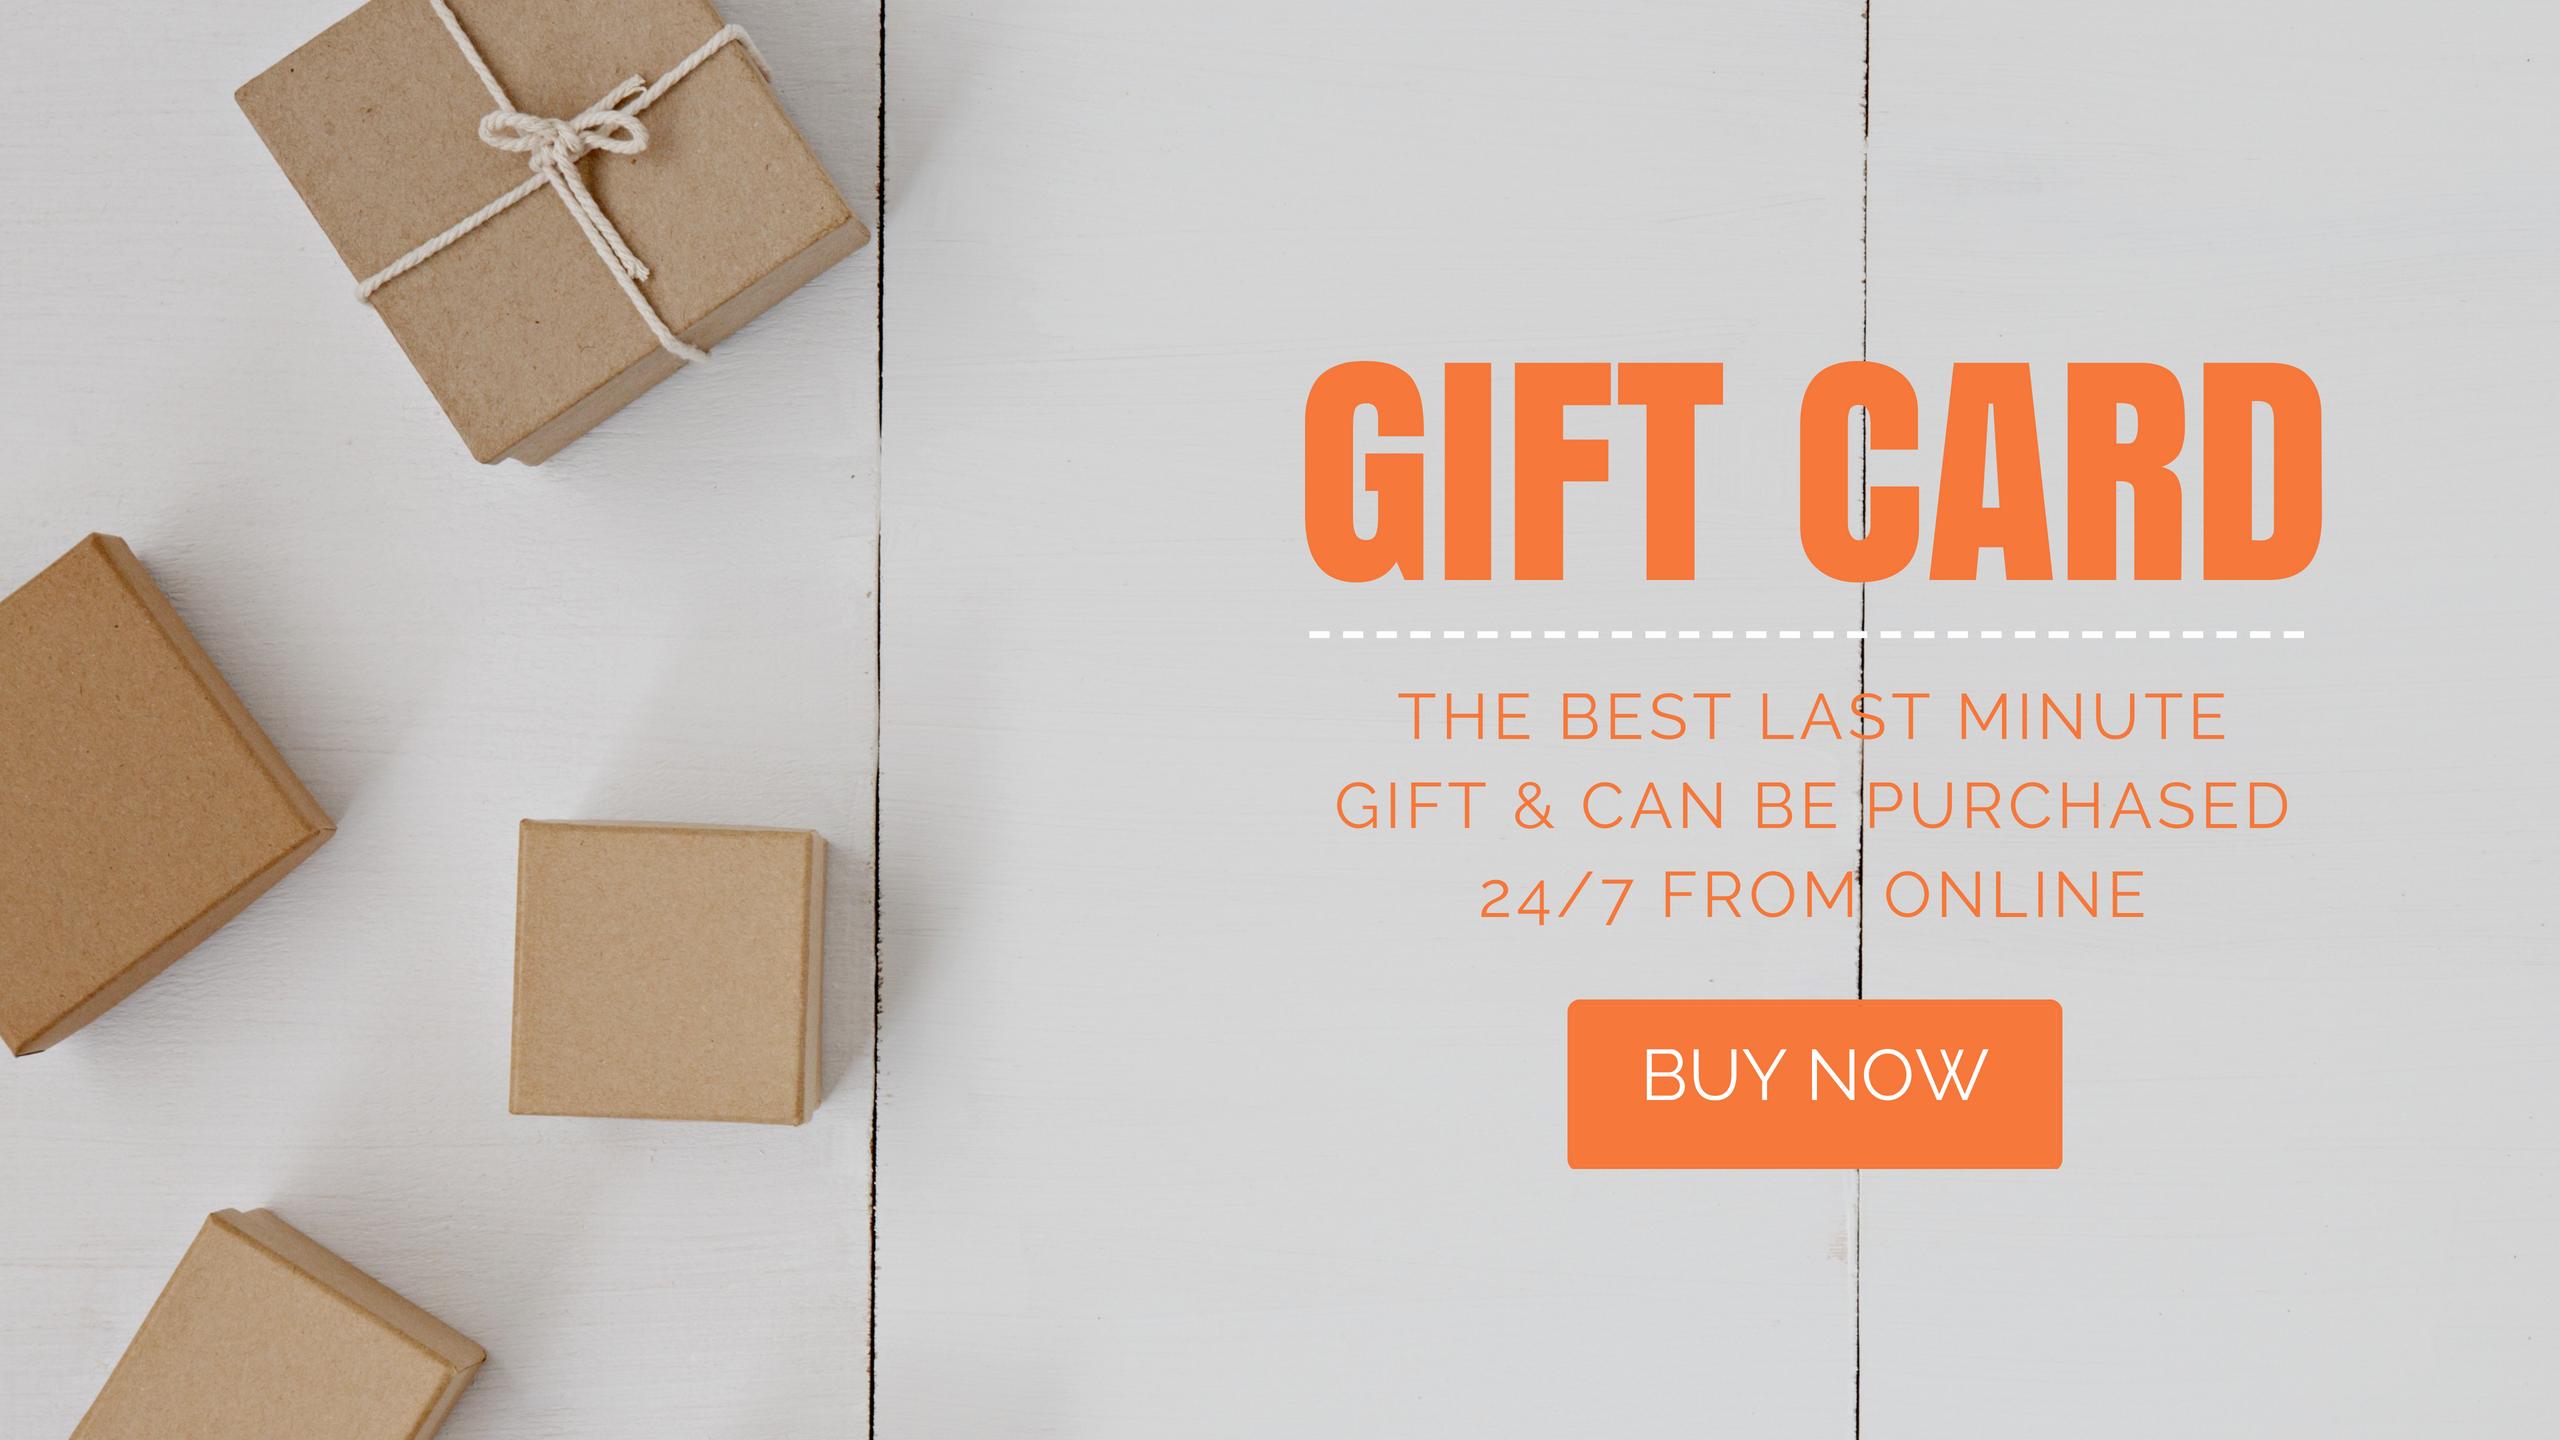 Gift Card Snackin' Free Paleo Cafe